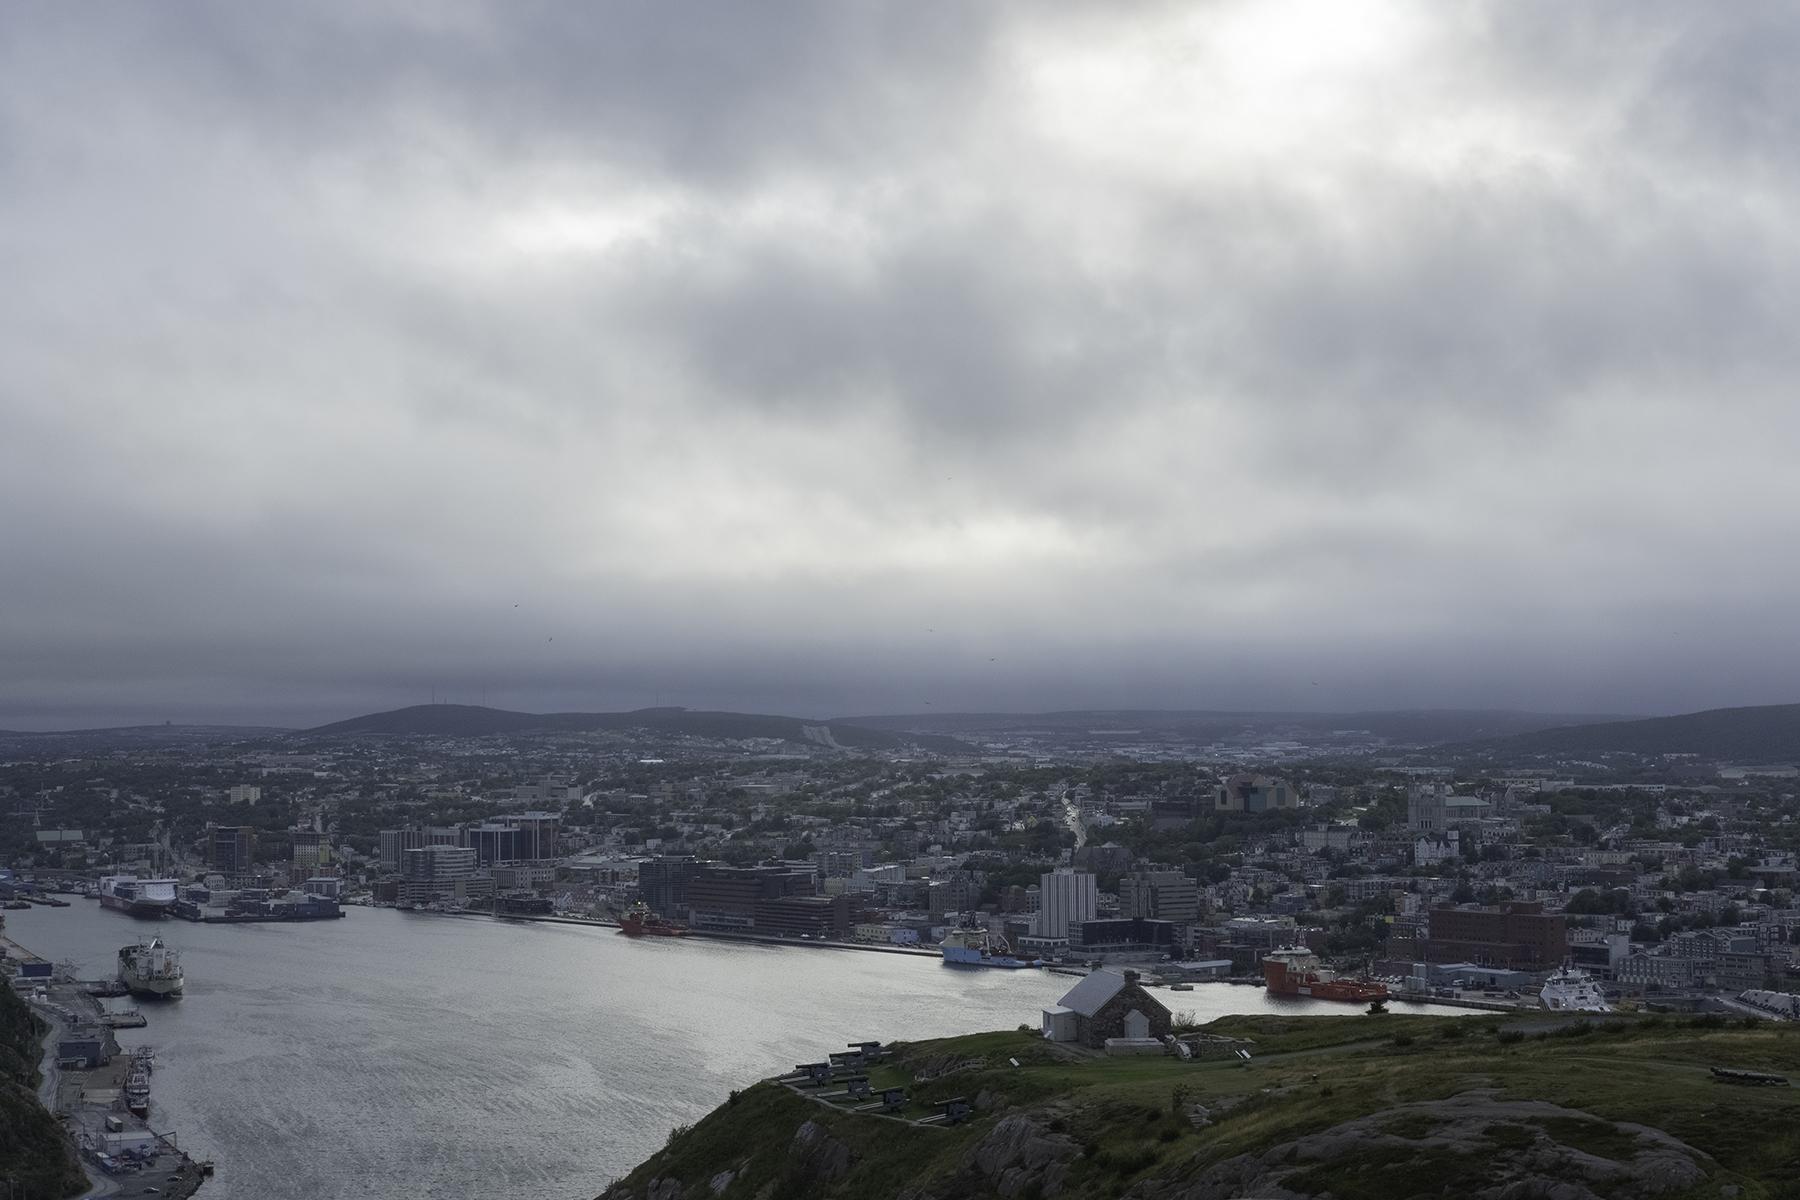 St. John's, Newfoundland. 2018